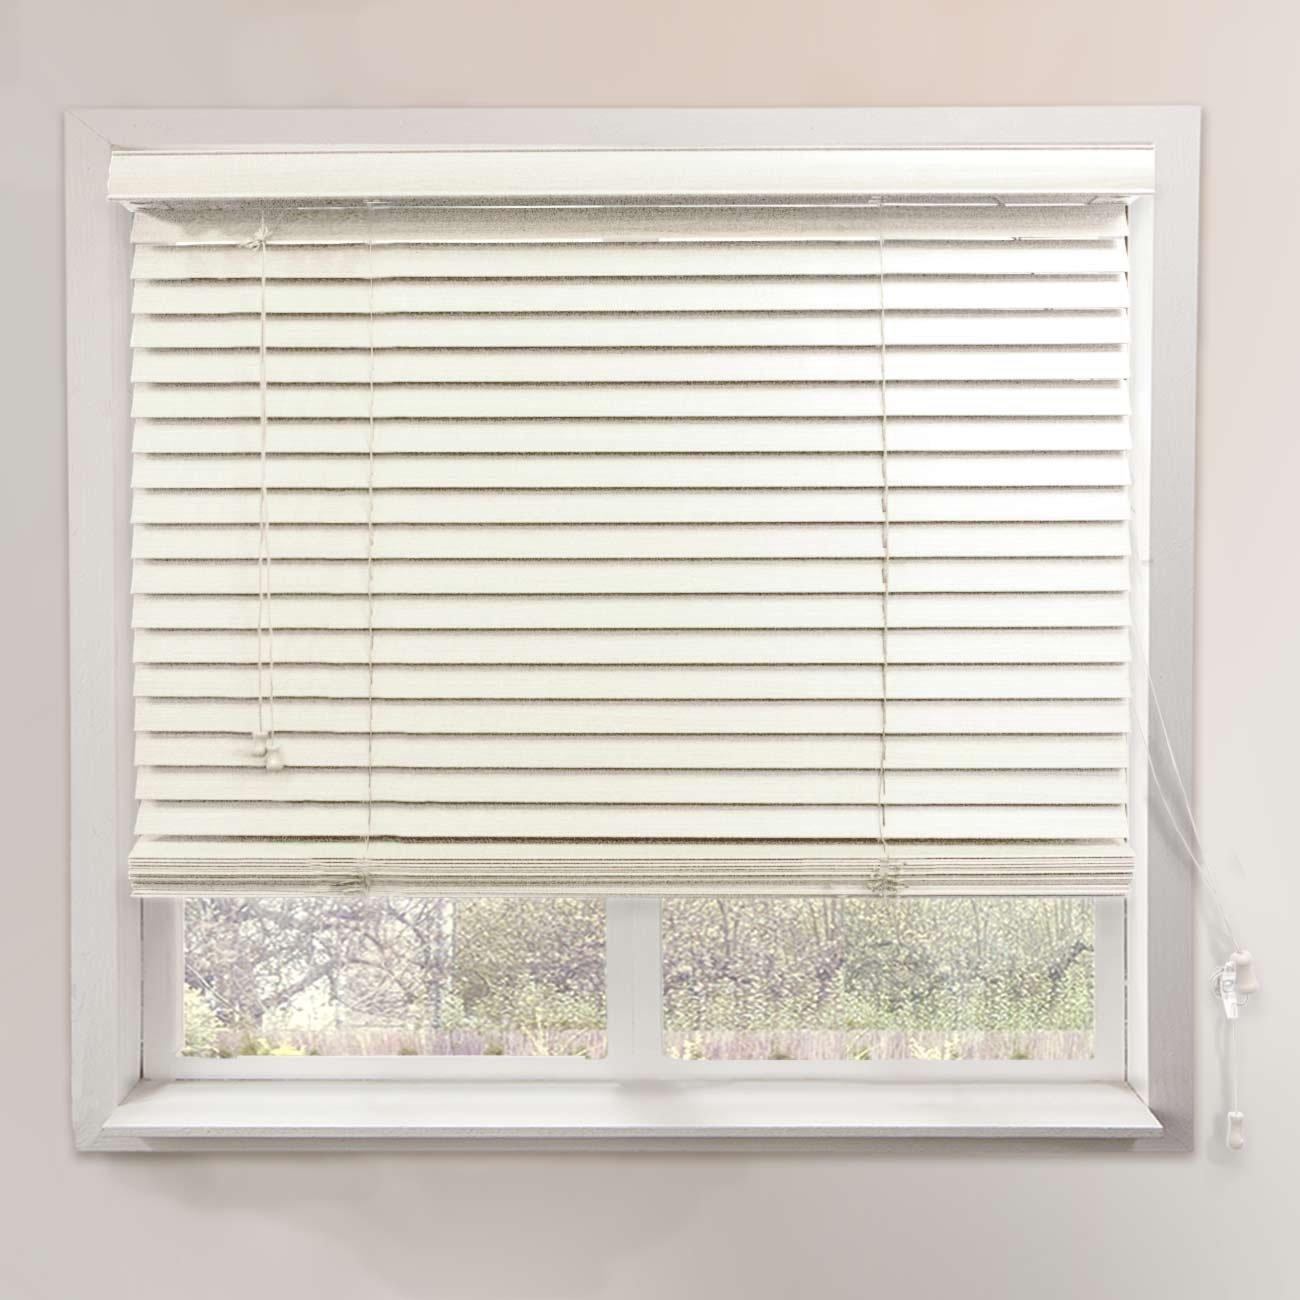 "Chicology Faux Wood Blind 2"" Slats Clean and Sleek Horizontal Venetian, 23"" x 64"", Simply White"